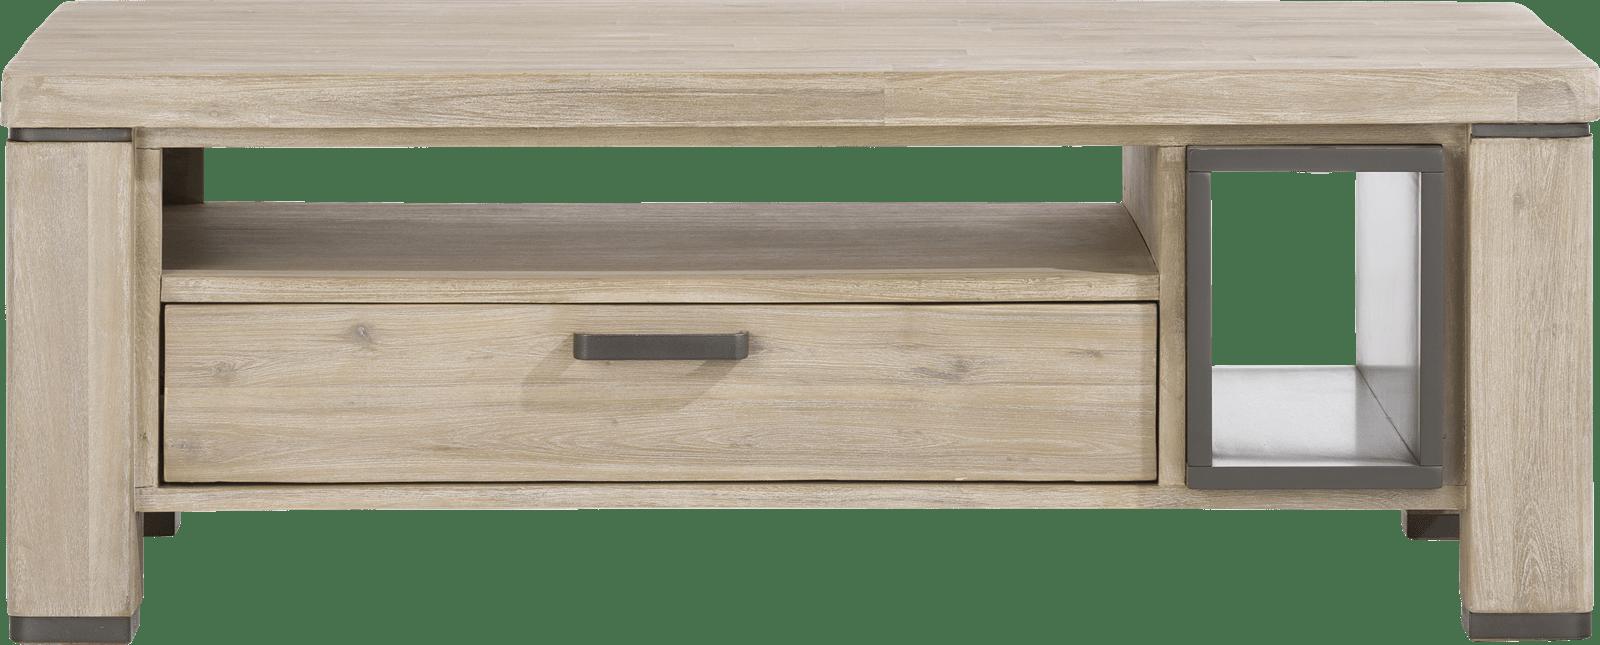 Happy@Home - Coiba - Modern - salontafel 125 x 60 cm + 1-lade t&t + 2-niches